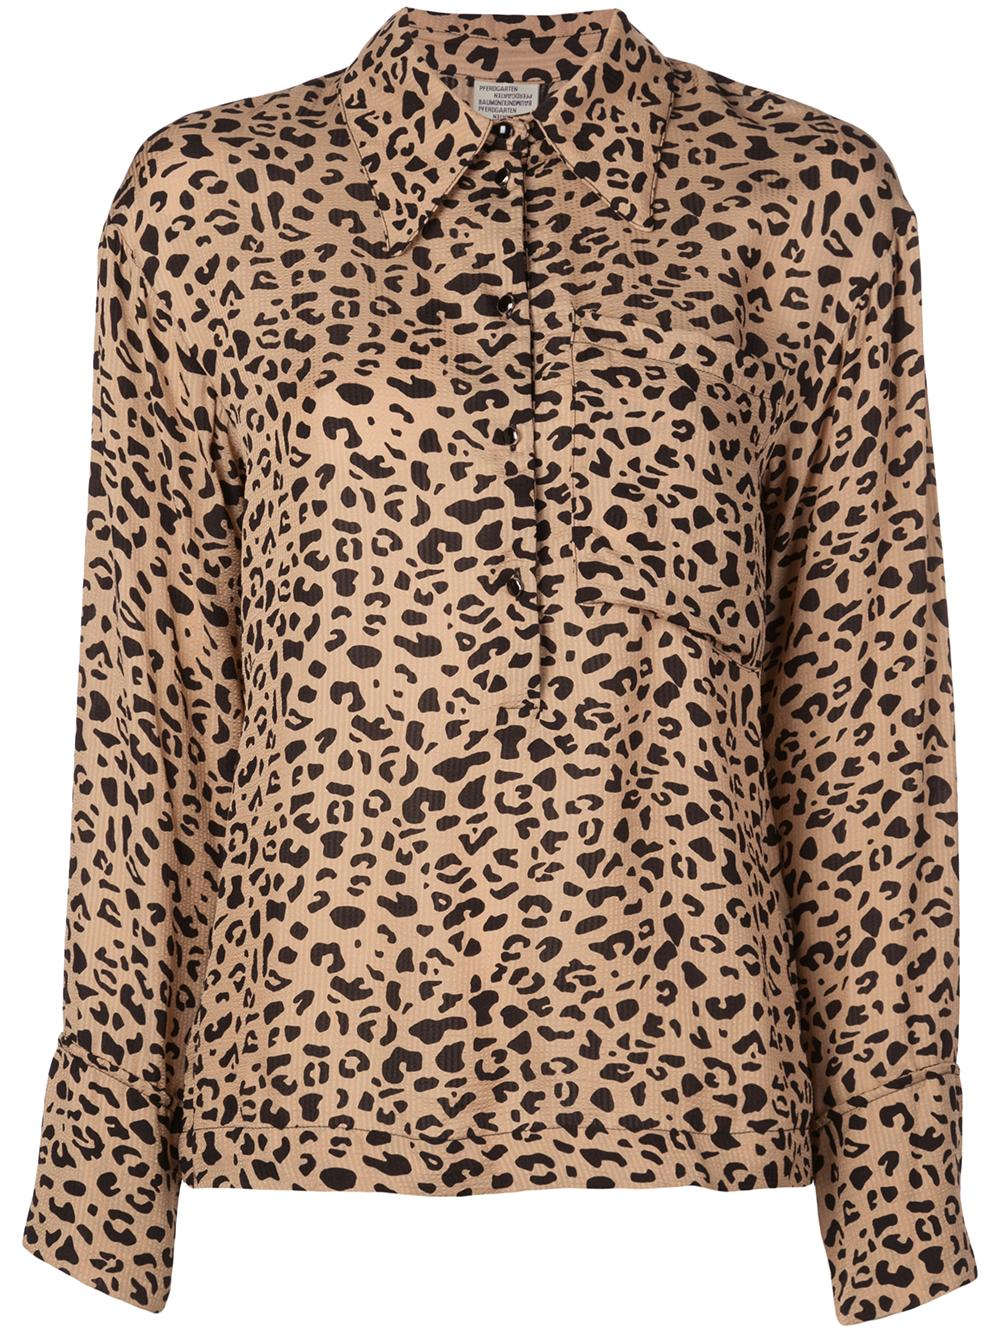 Moxie Leopard Buttonup One Pocket Bls Item # 20491